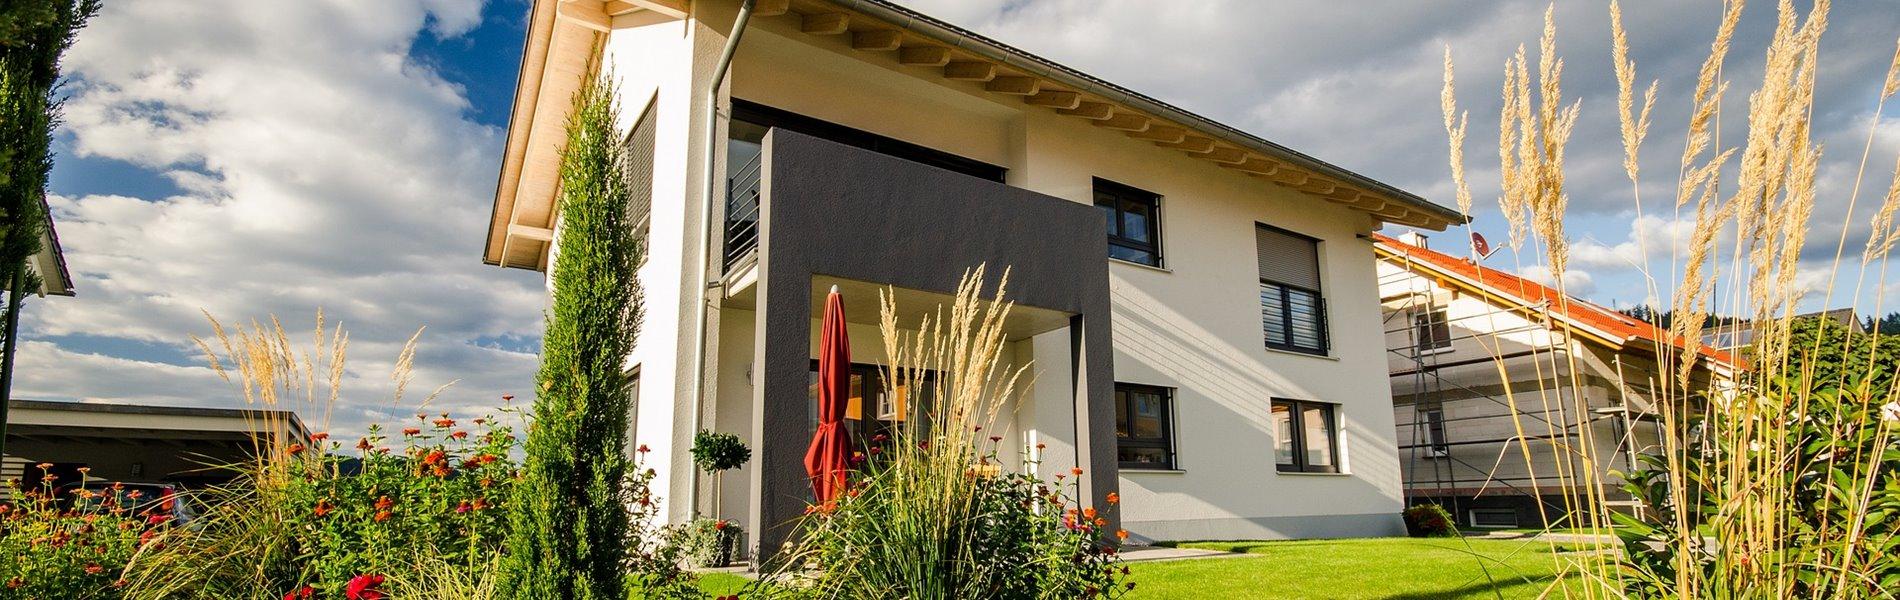 fliesenleger-renovierung-wendler-oberharmersbach